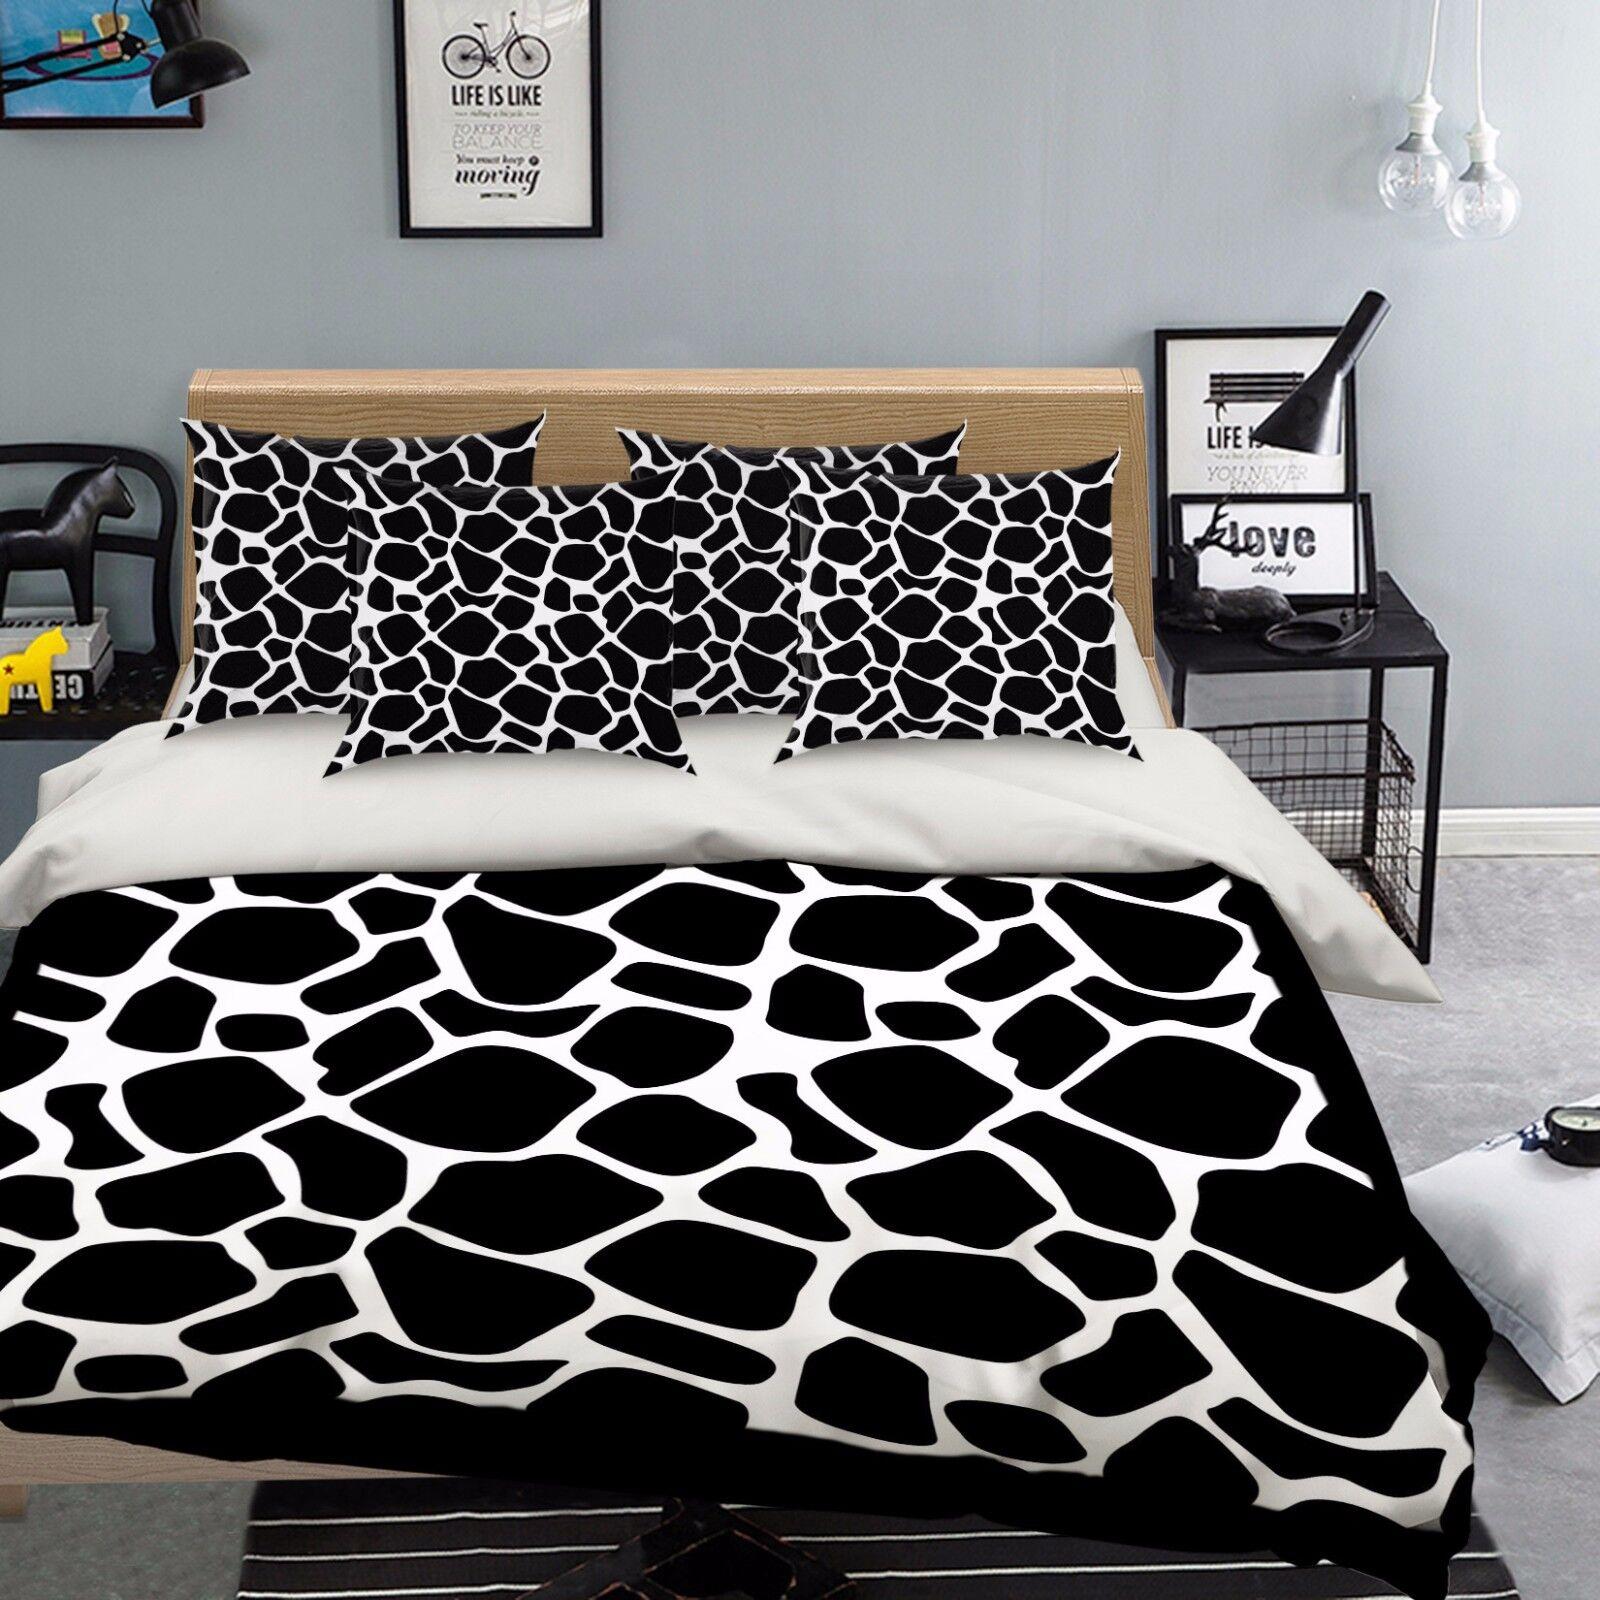 3D Streaks 907 Bed Pillowcases Quilt Duvet Cover Set Single Queen UK Summer